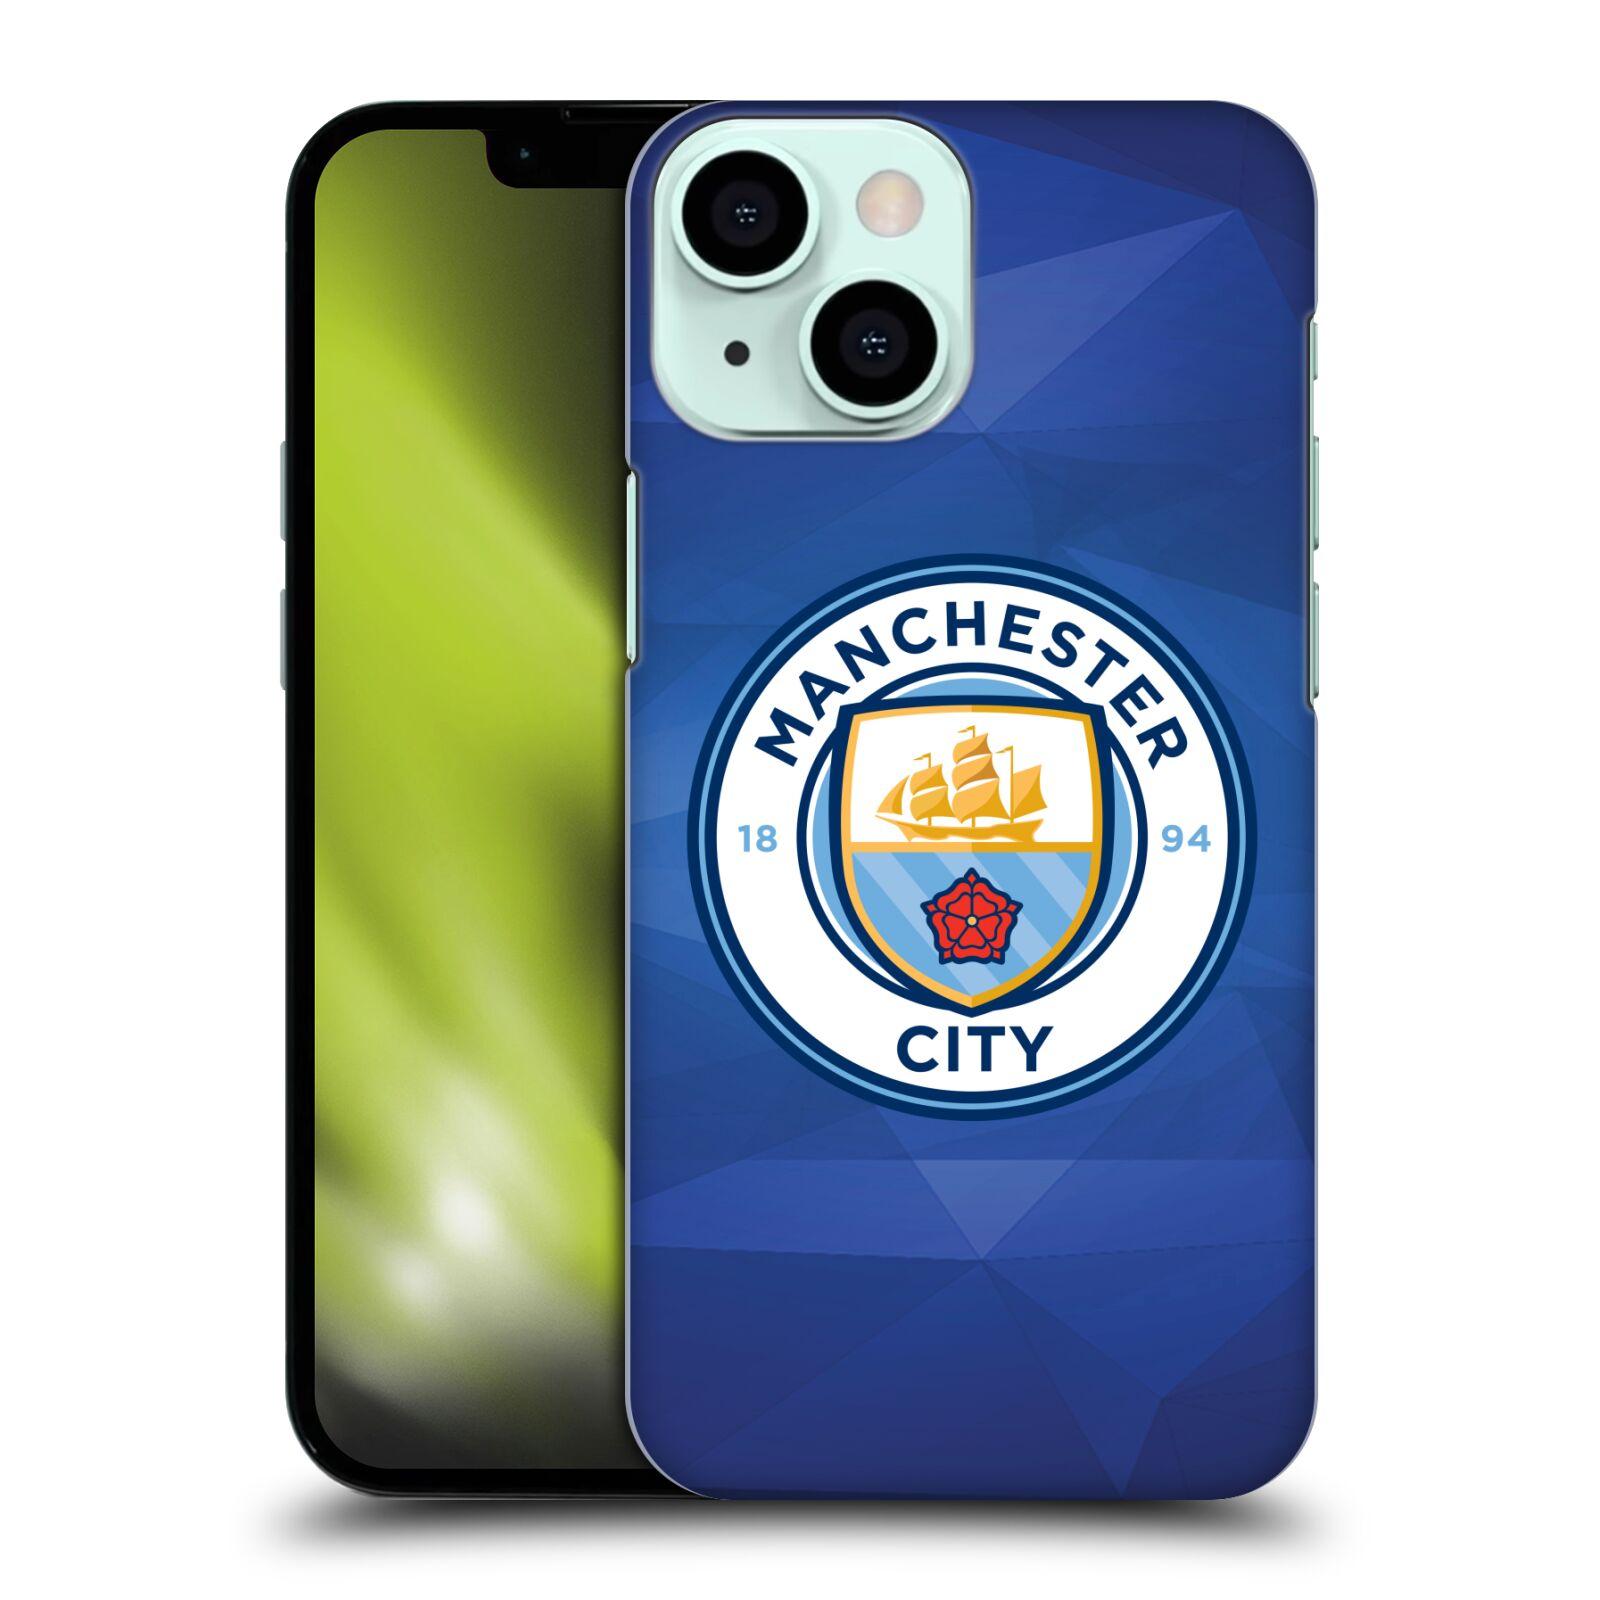 Plastové pouzdro na mobil Apple iPhone 13 Mini - Head Case - Manchester City FC - Modré nové logo